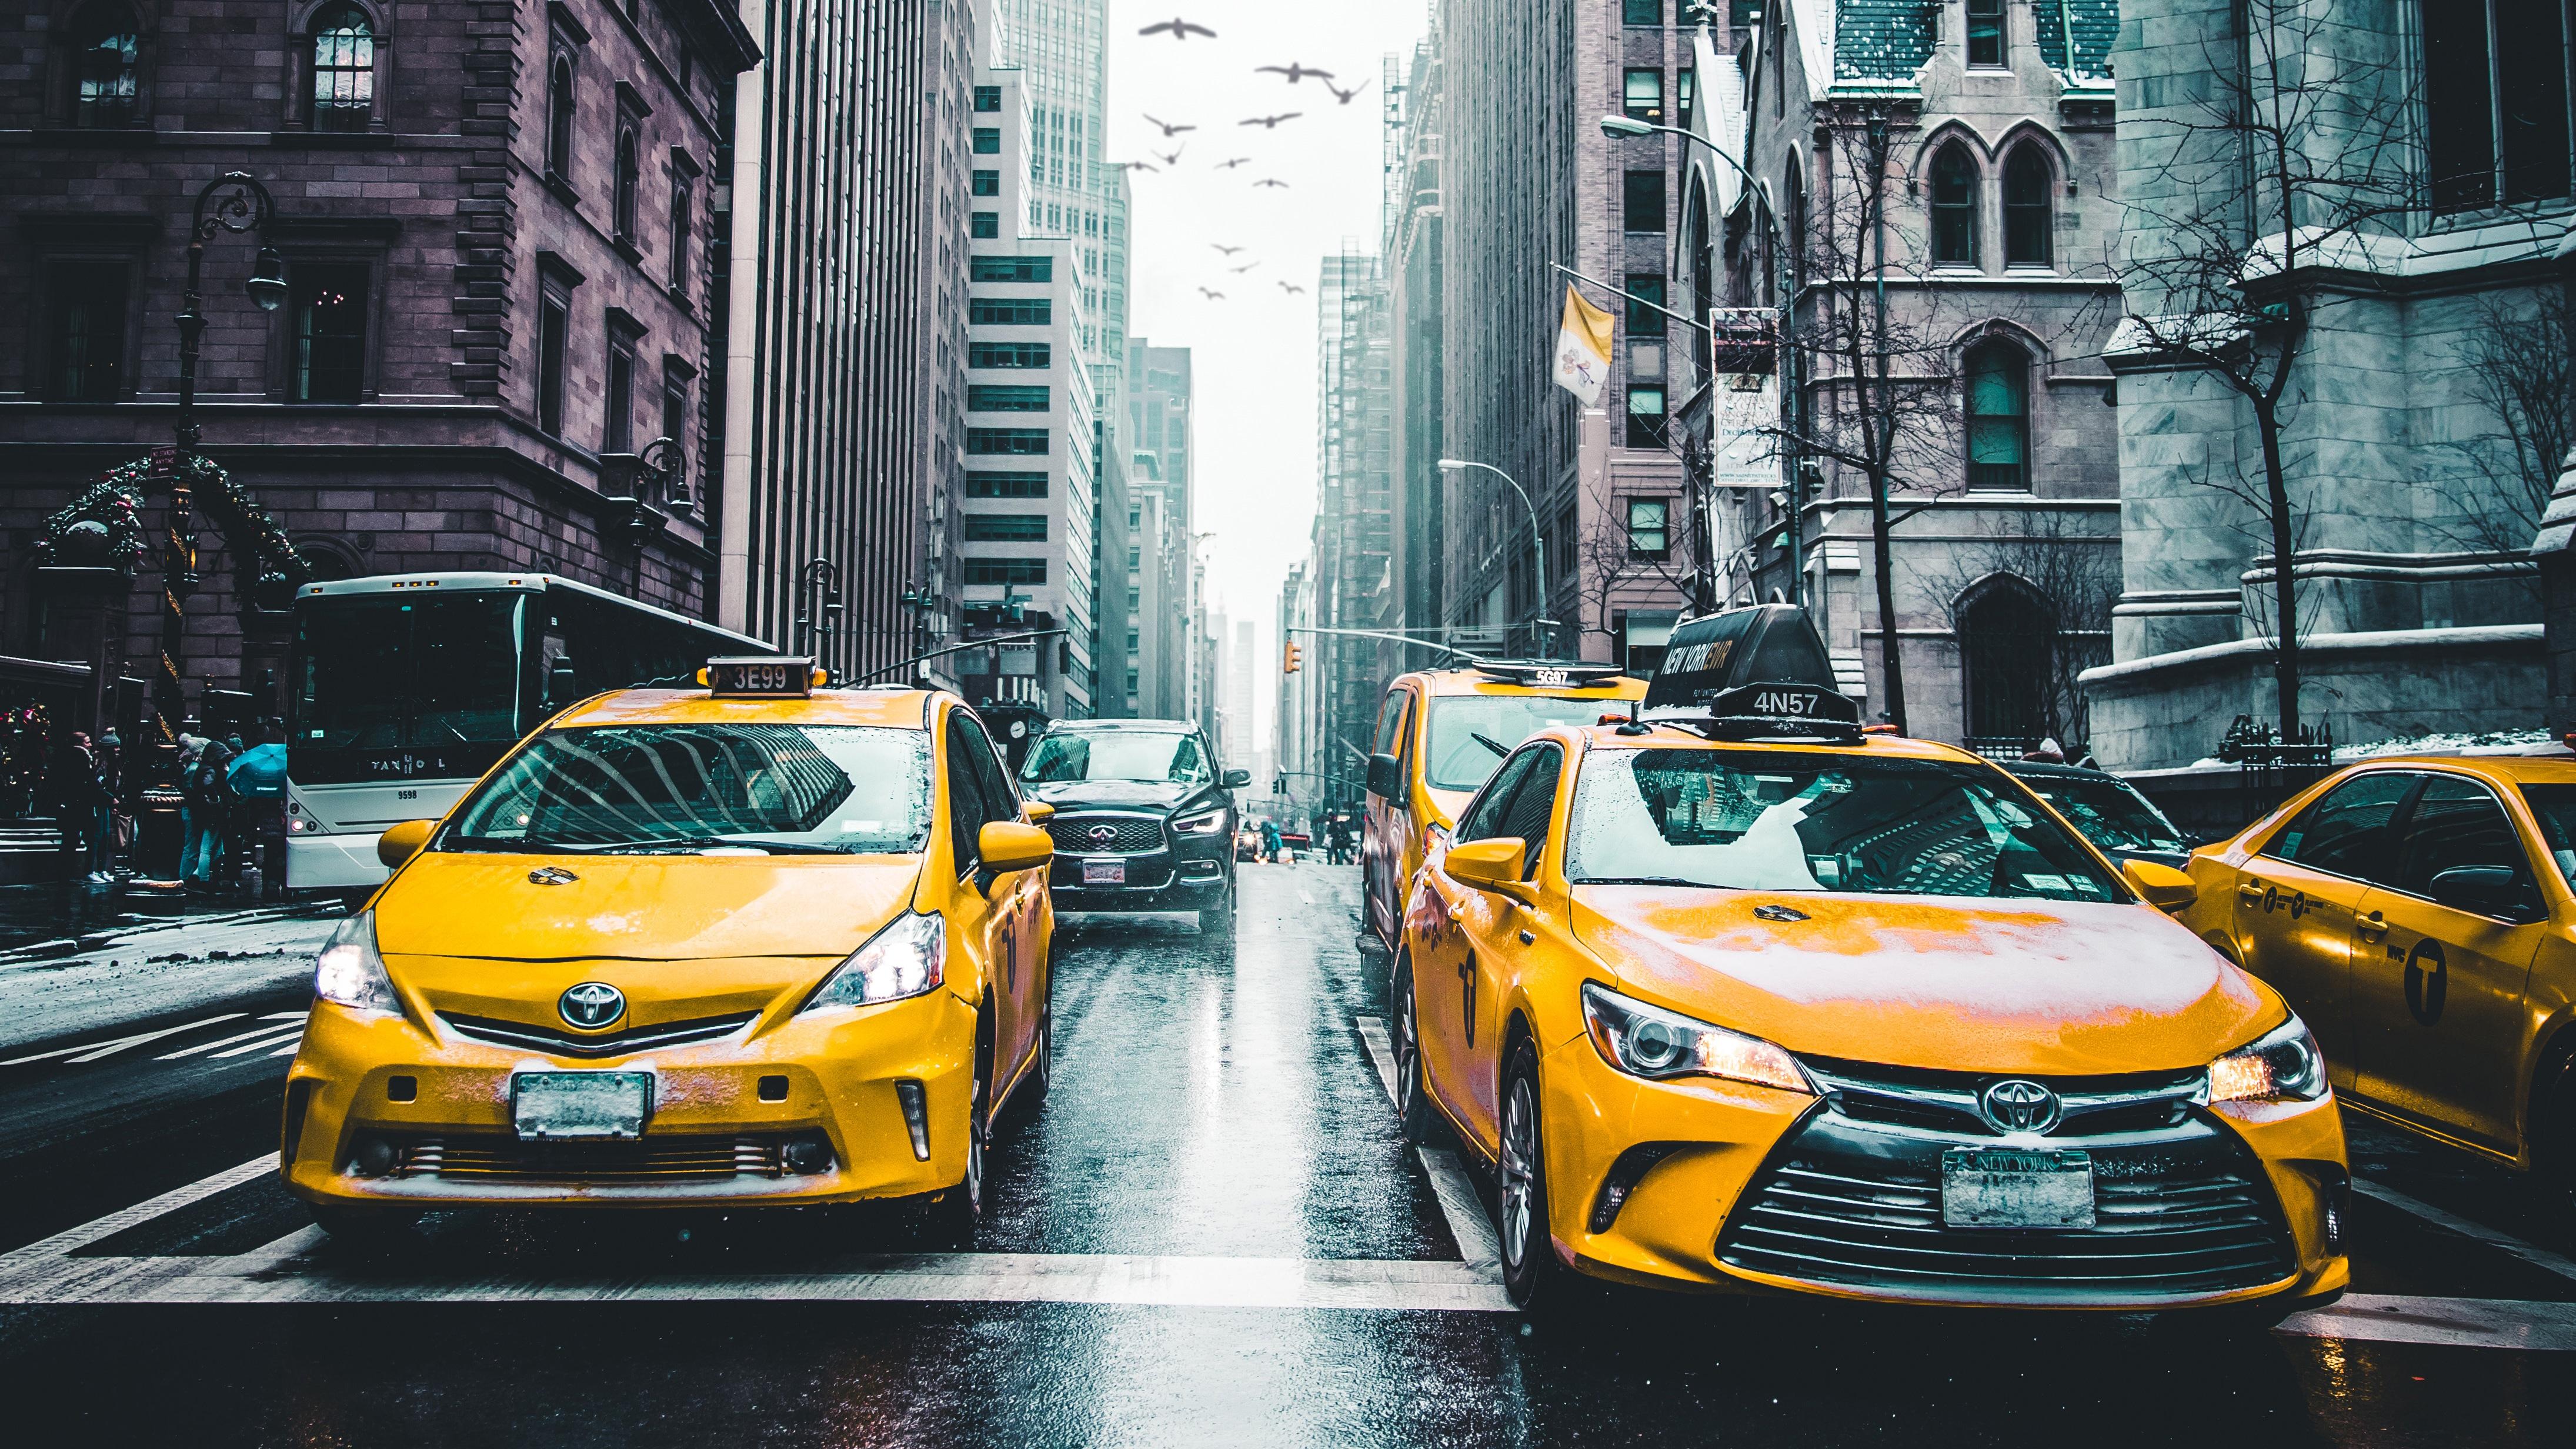 New York City Buildings Hd